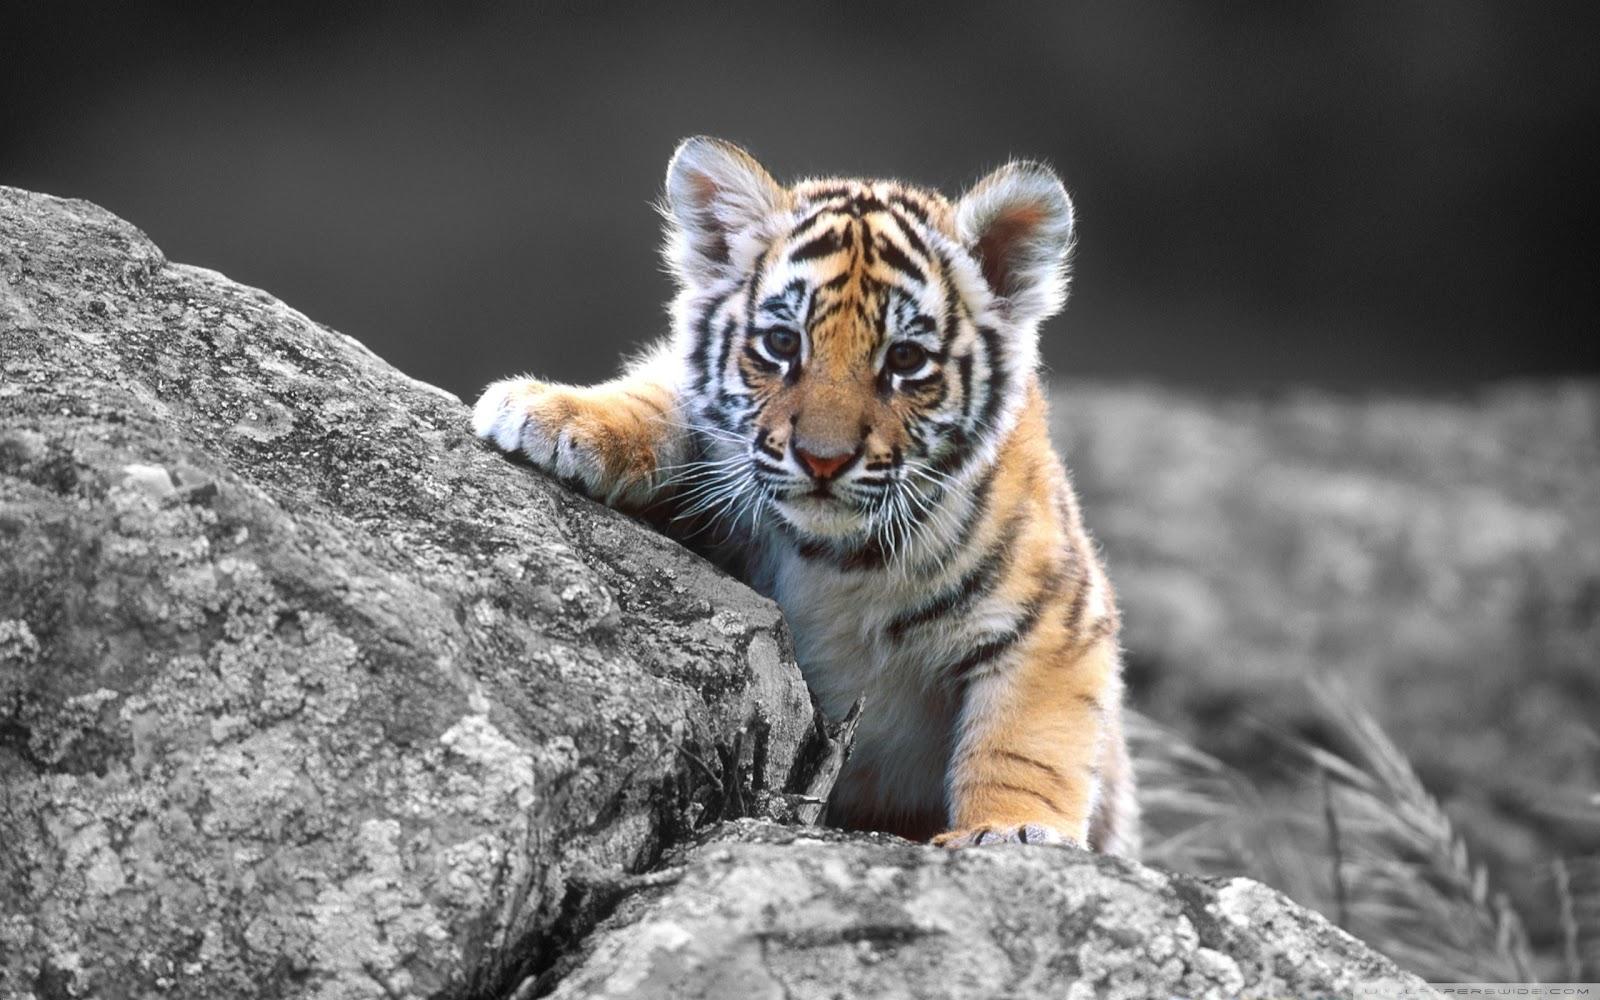 http://3.bp.blogspot.com/-BrQPvWJt_g0/UDVzgYB3W5I/AAAAAAAAELE/8PA2ZimcdwM/s1600/cute+tiger+wallpaper.jpg